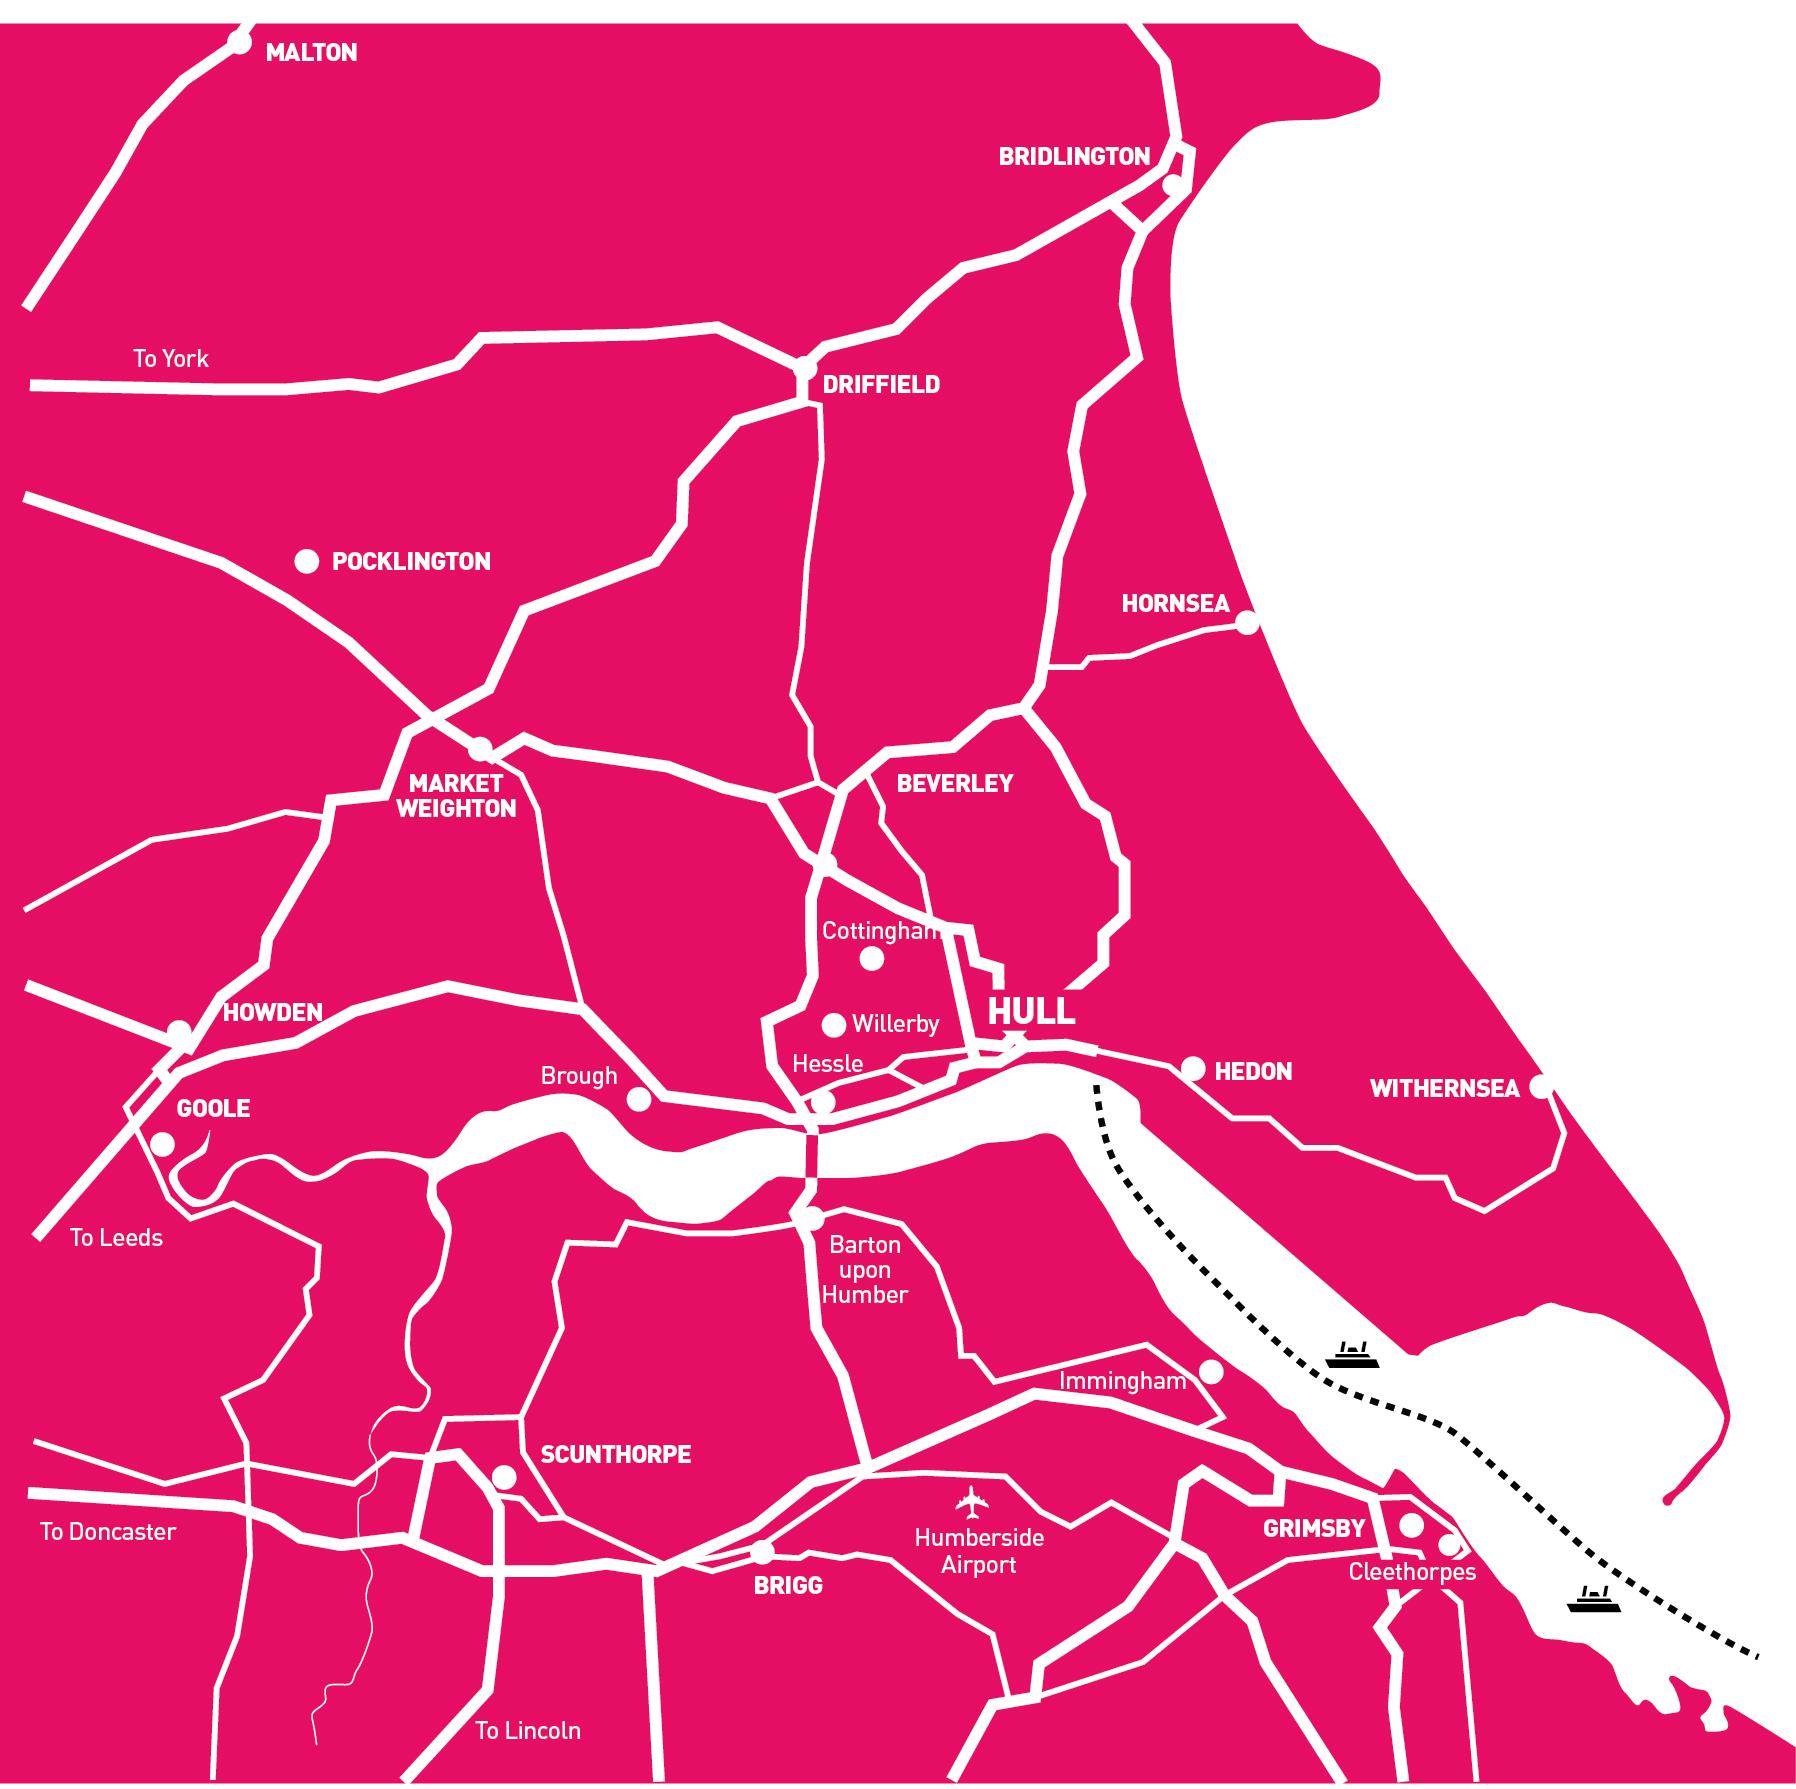 bondholder-humber-region-map